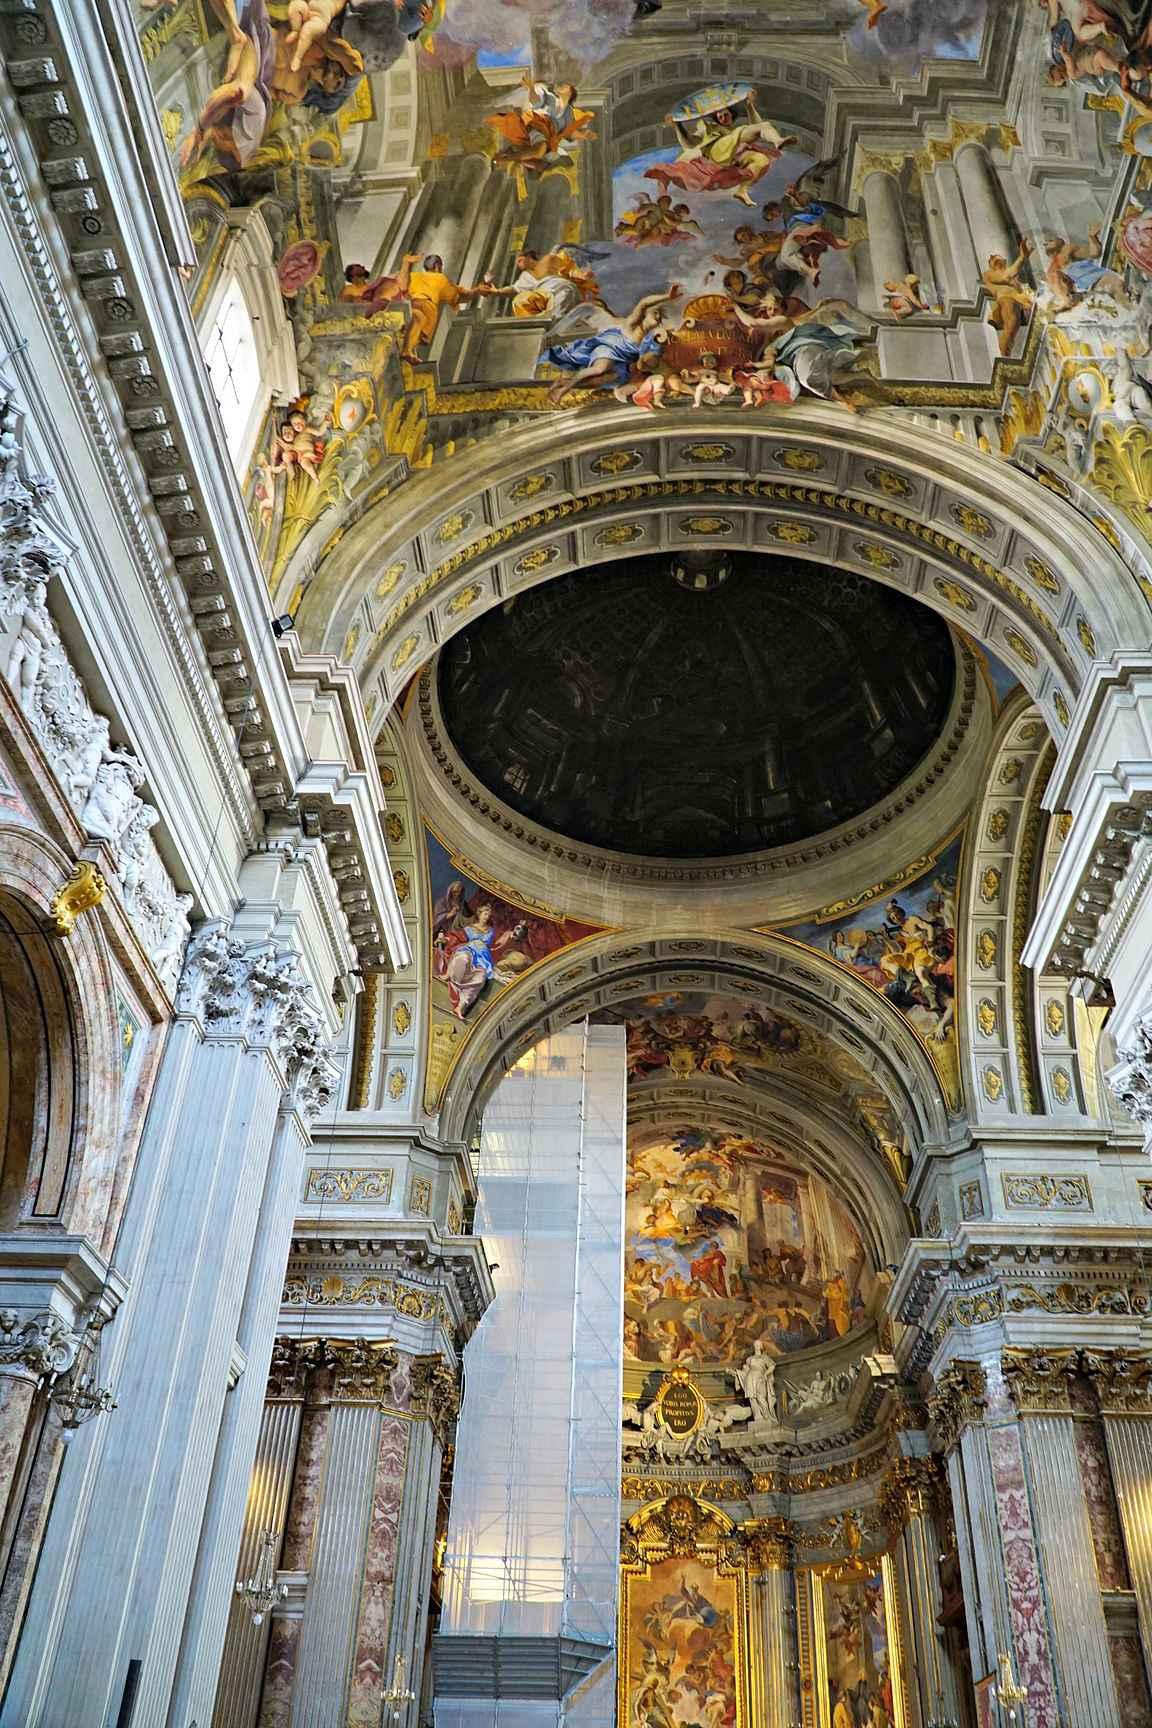 Santignazio di Loyola ja optinen harha copyright Kukkulalta / Heli